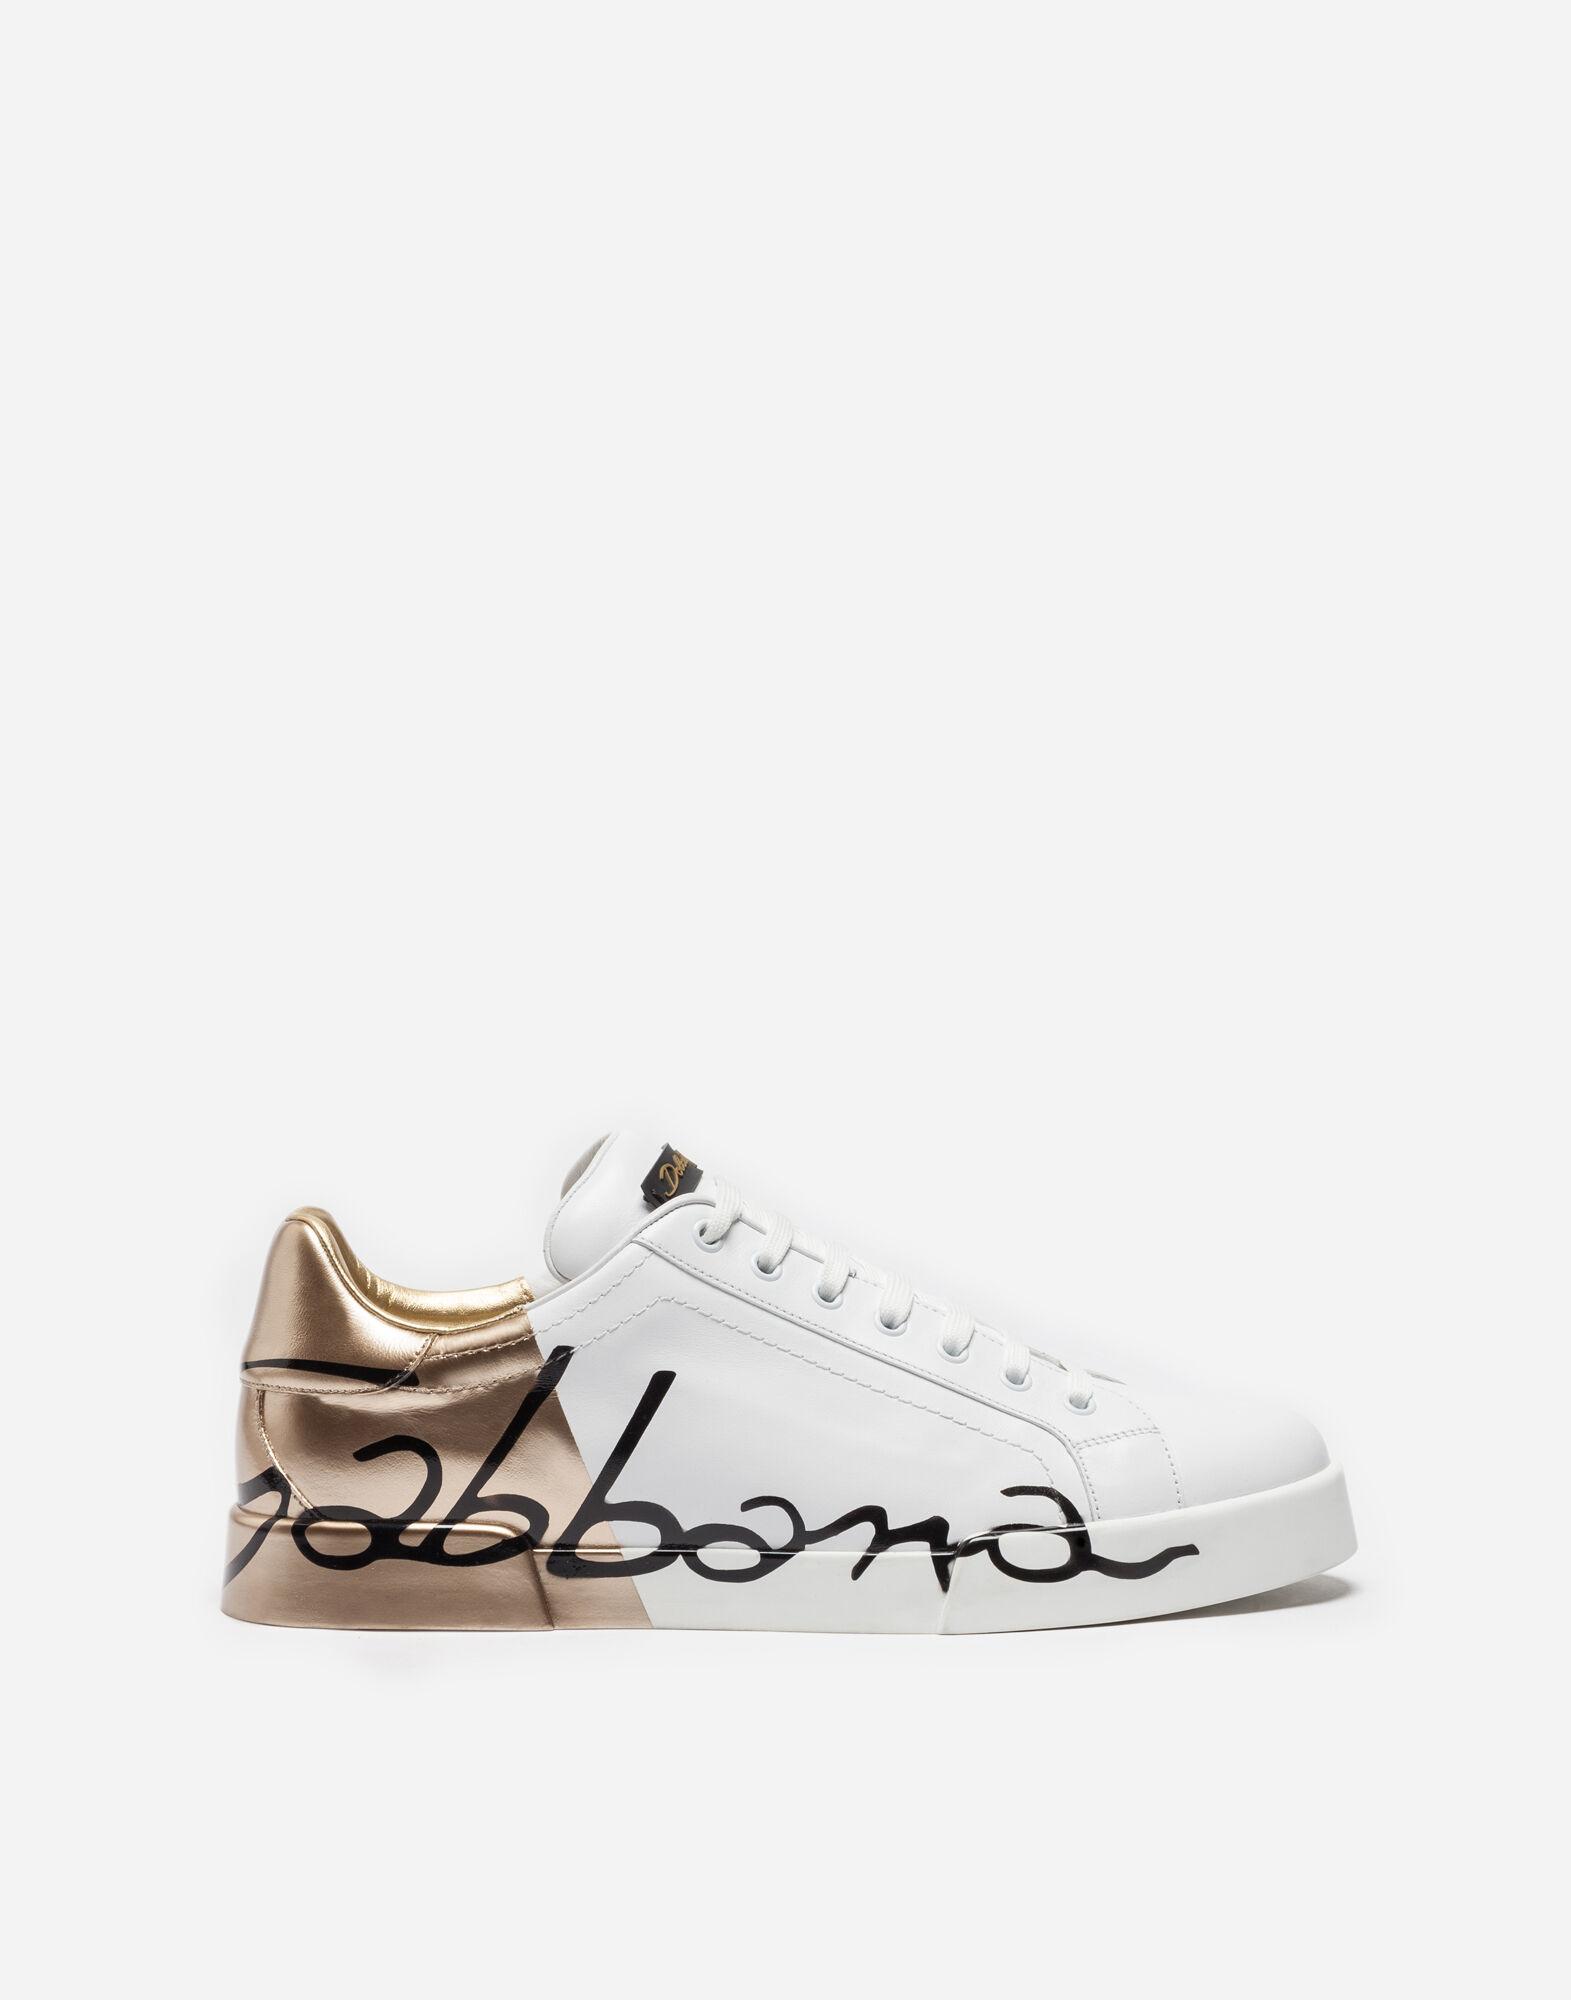 dolce gabbana portofino sneakers in leather and patent white modesens. Black Bedroom Furniture Sets. Home Design Ideas